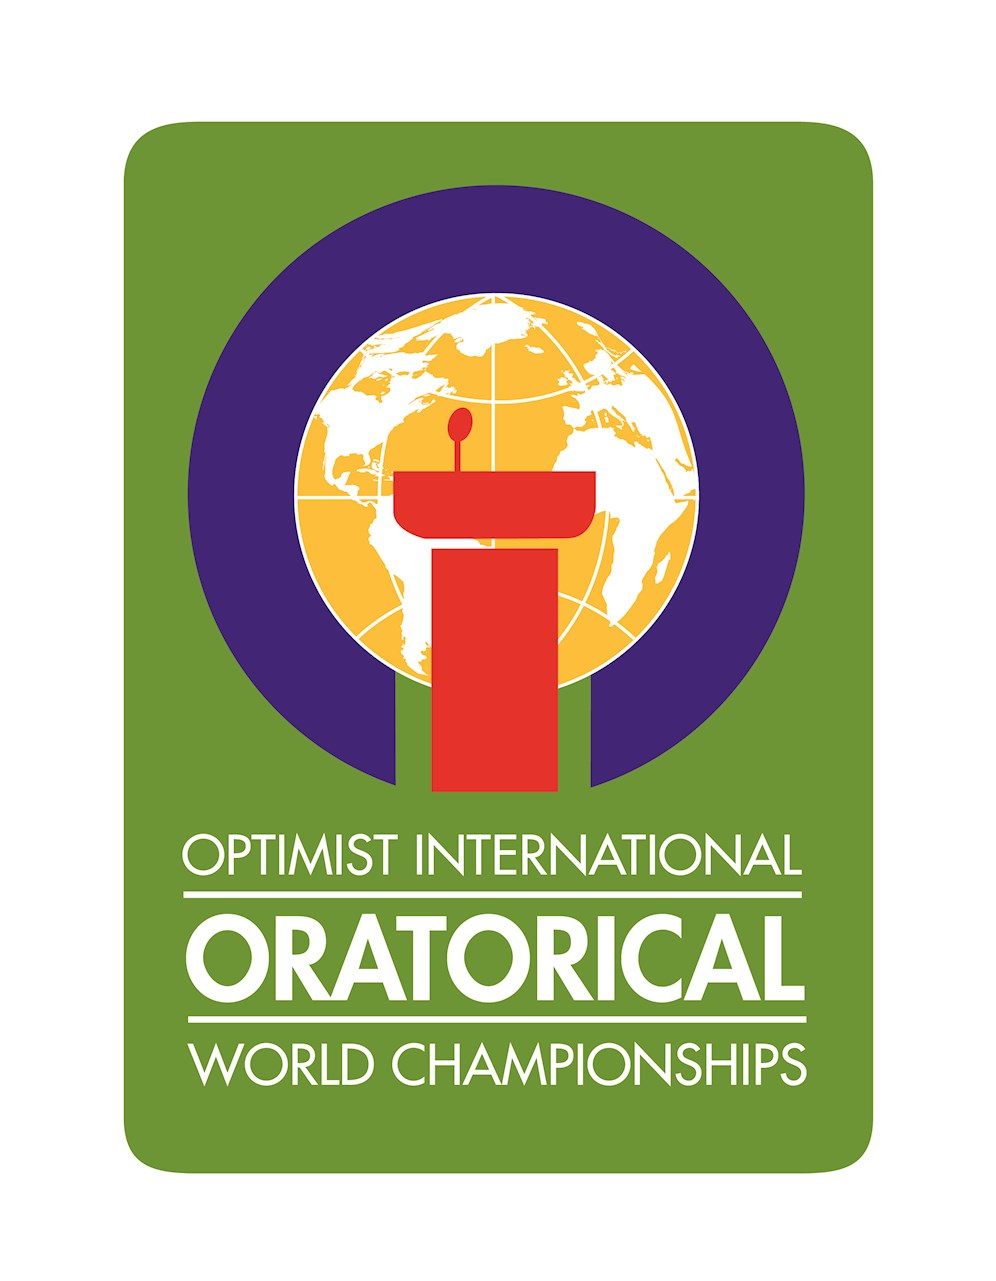 006 Optimist International Essay Contest Example Oratorical High Wondrous Winners Rules Full